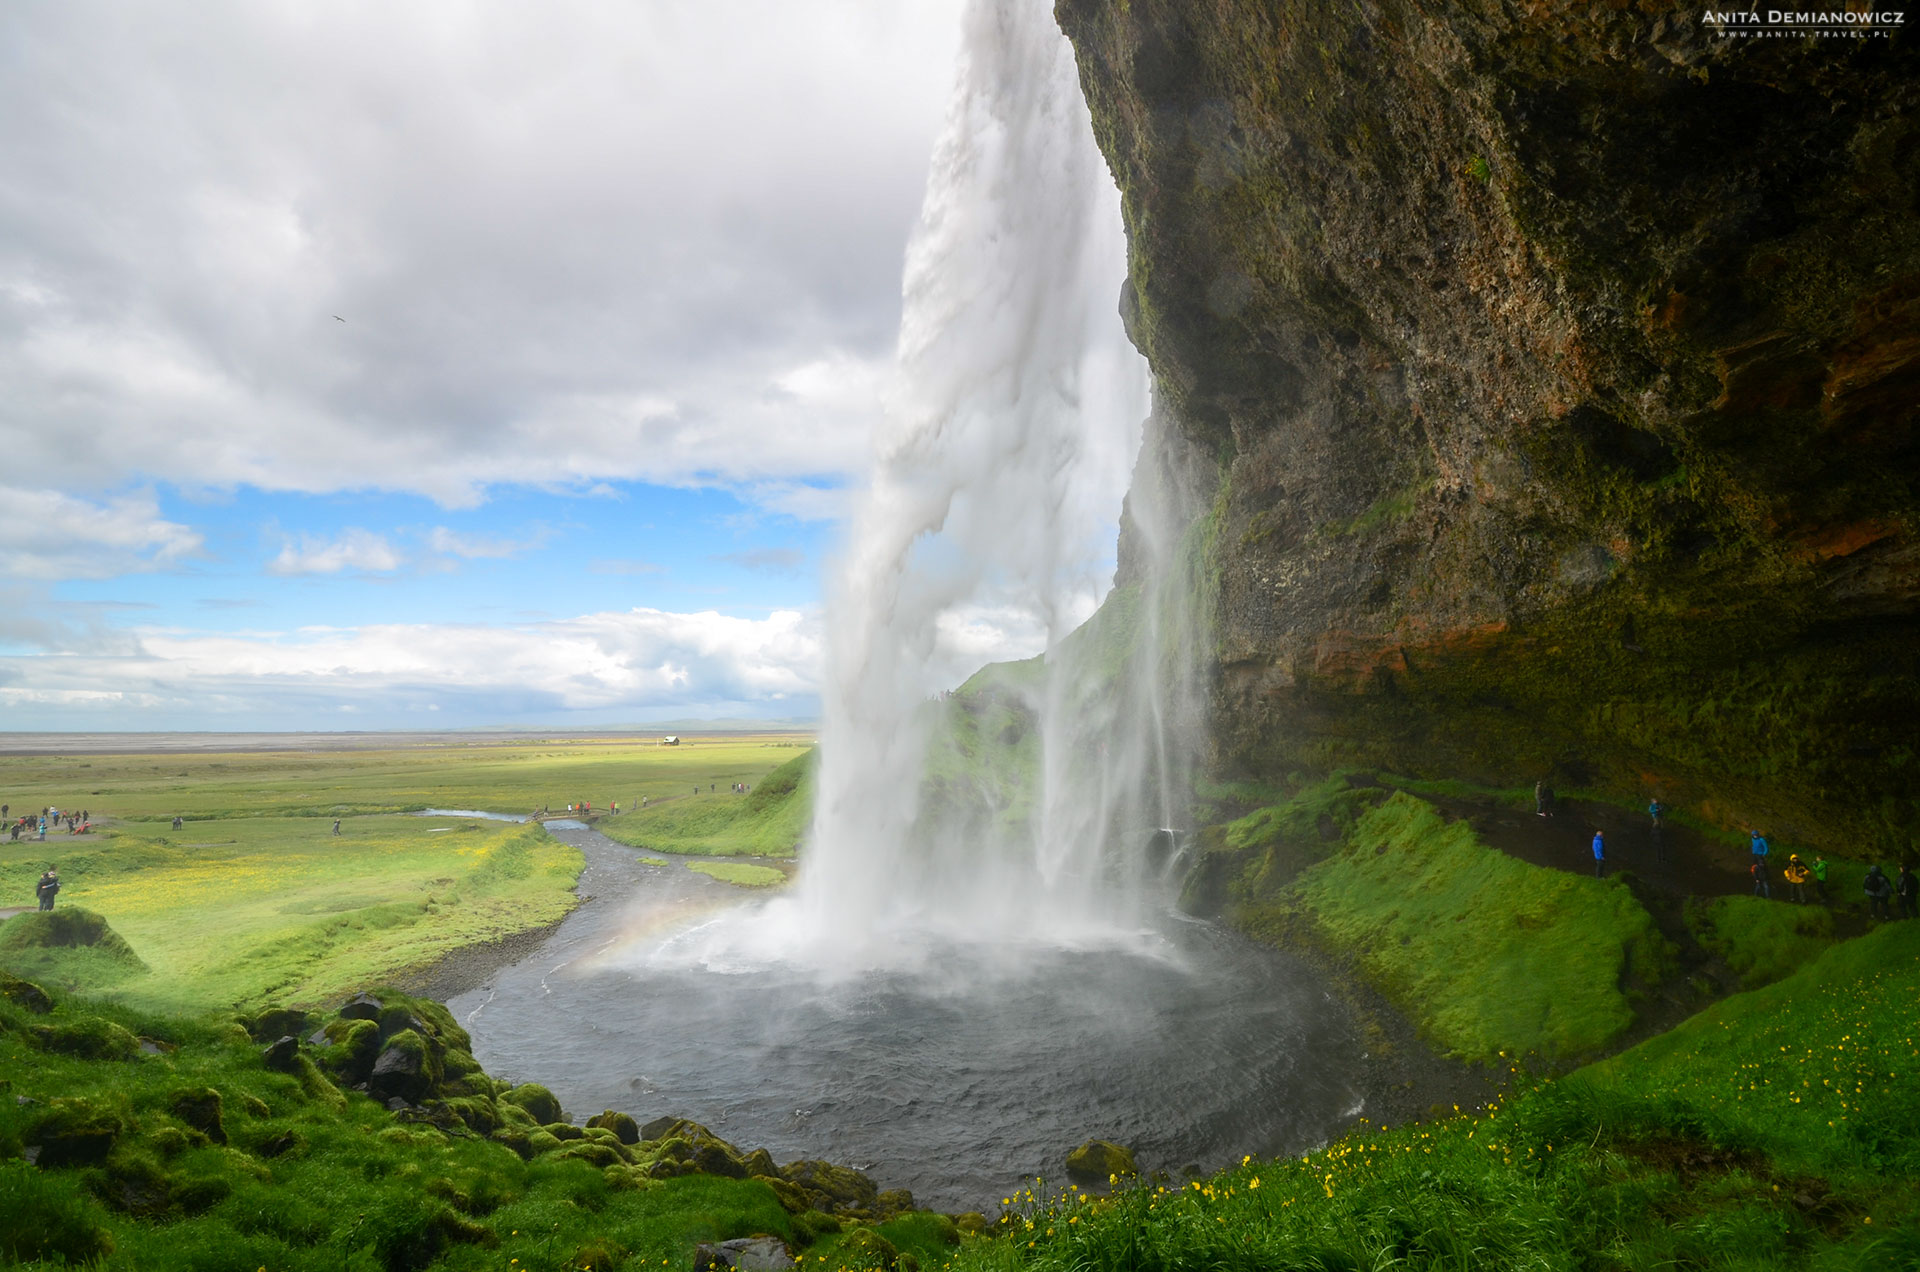 Wodospad Seljalansfoss, Islandia, Anita Demianowicz